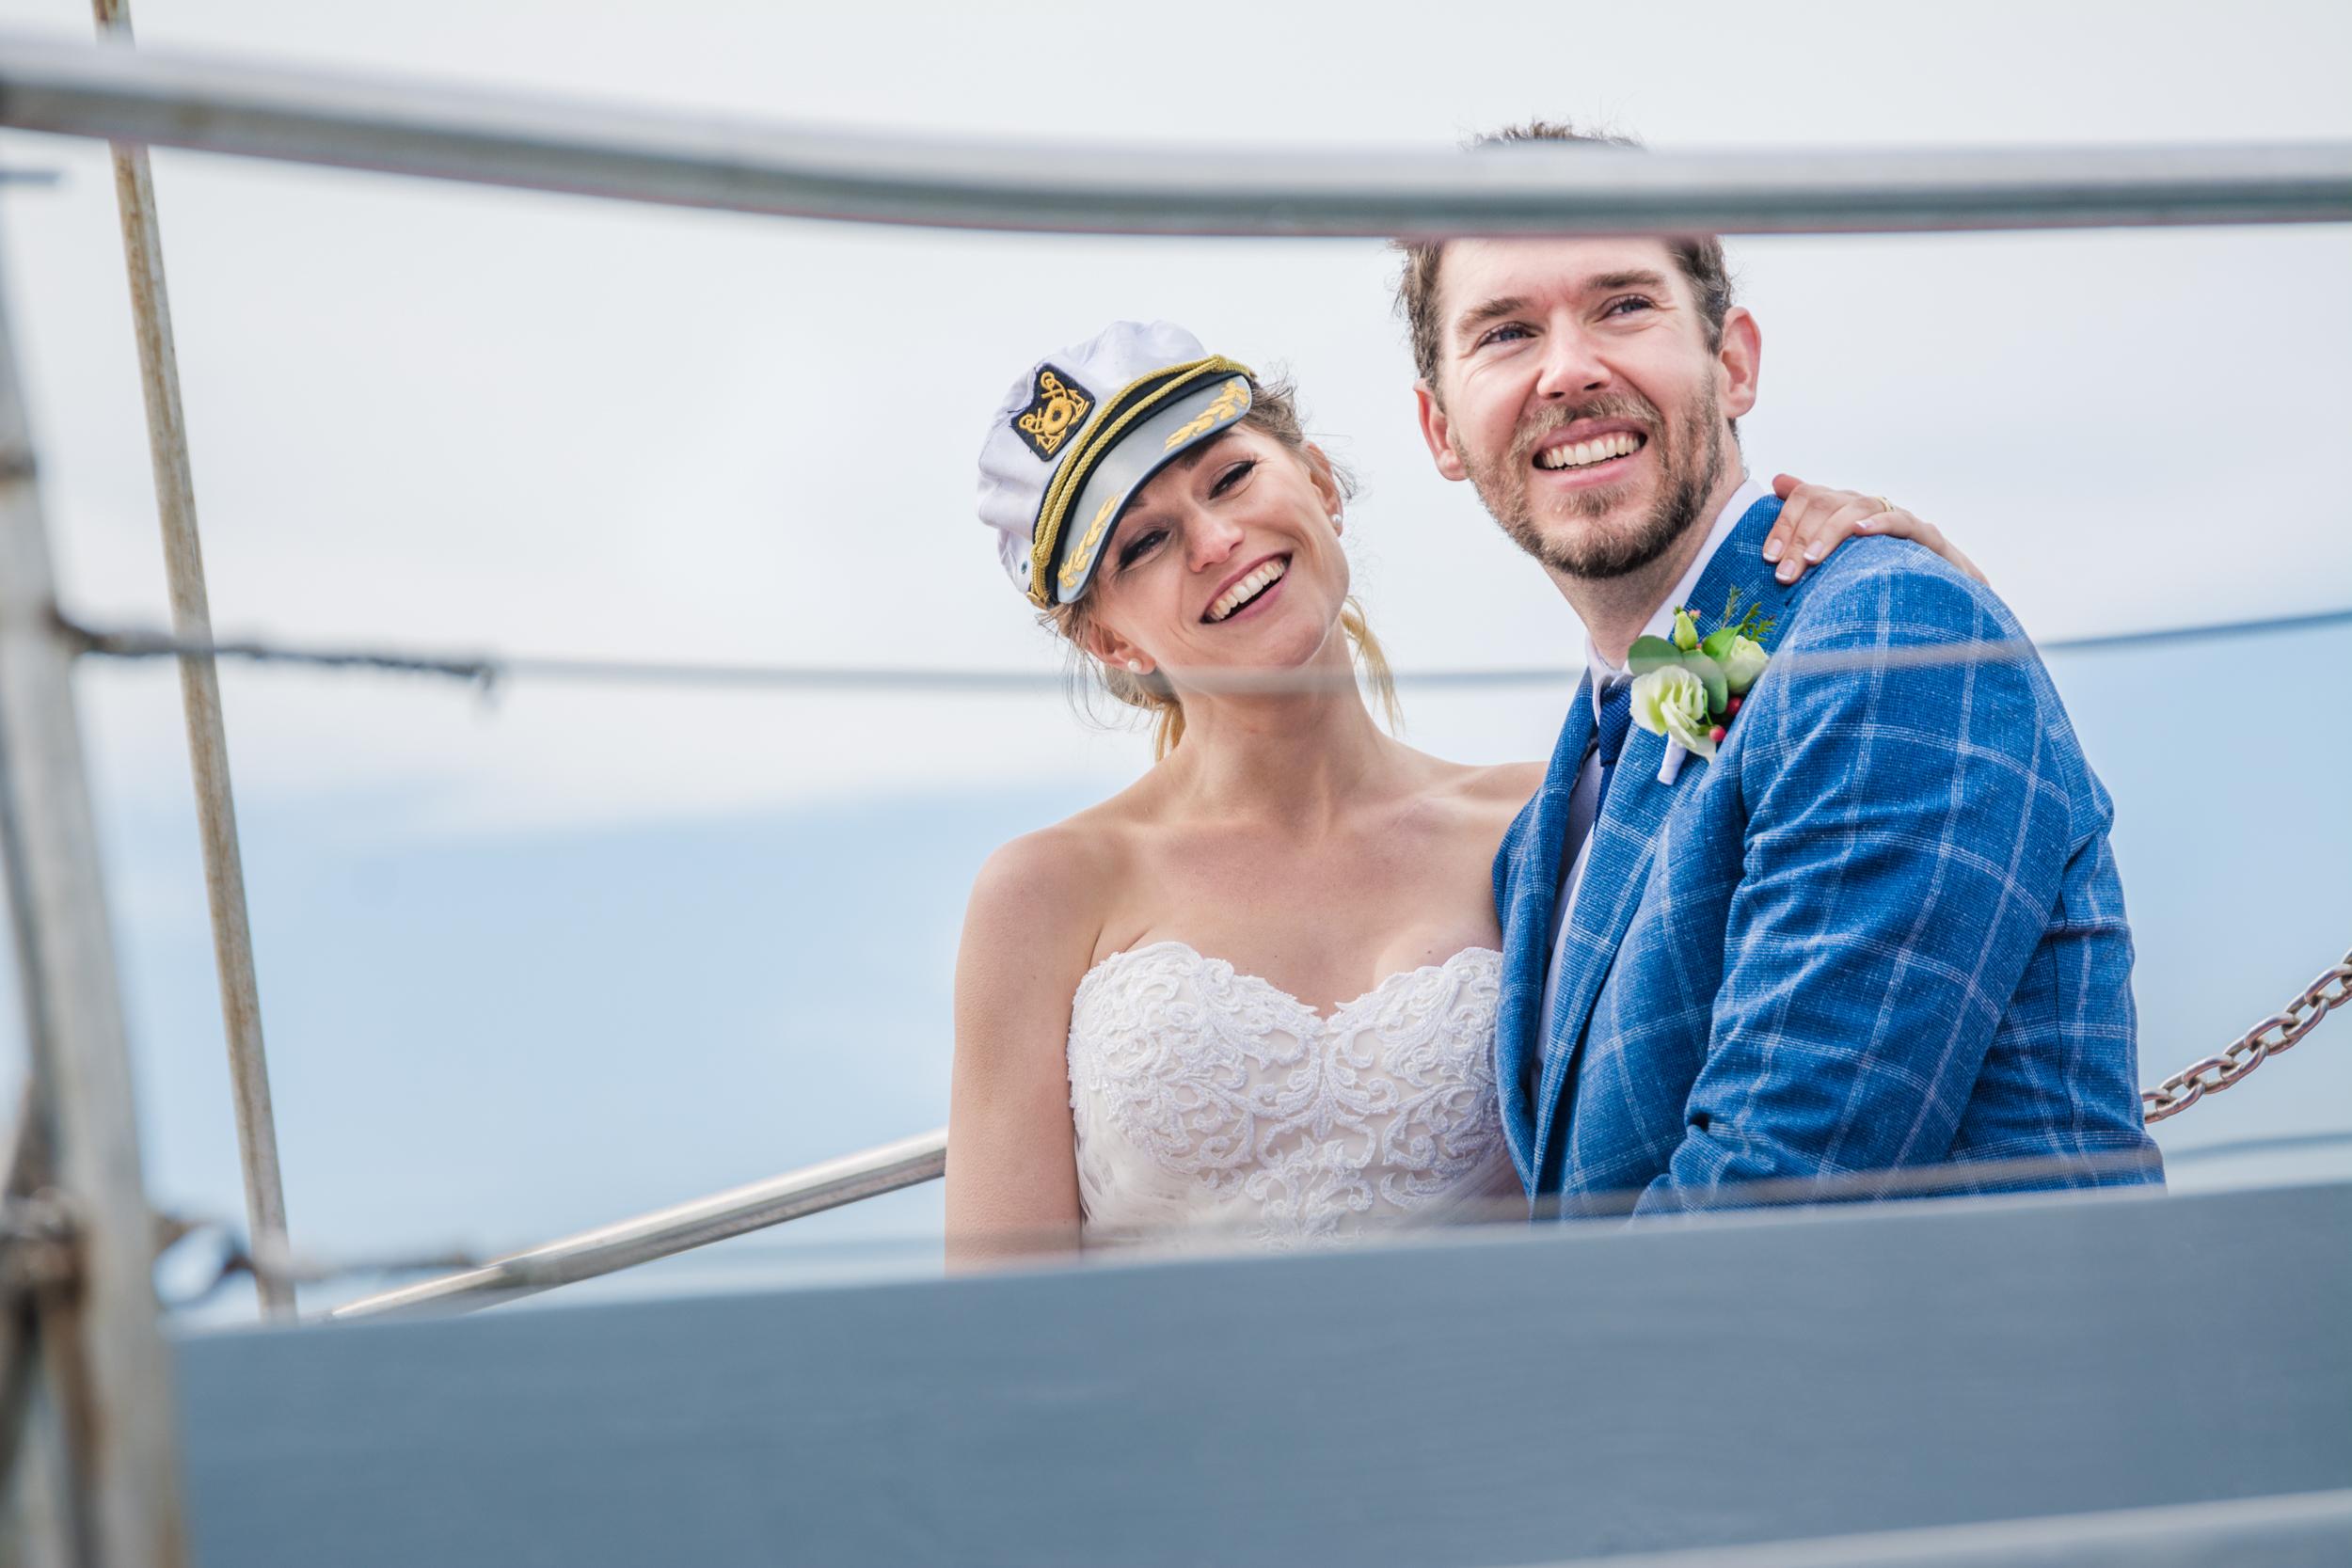 DonJess-ocean-wedding-novascotia-15.jpg